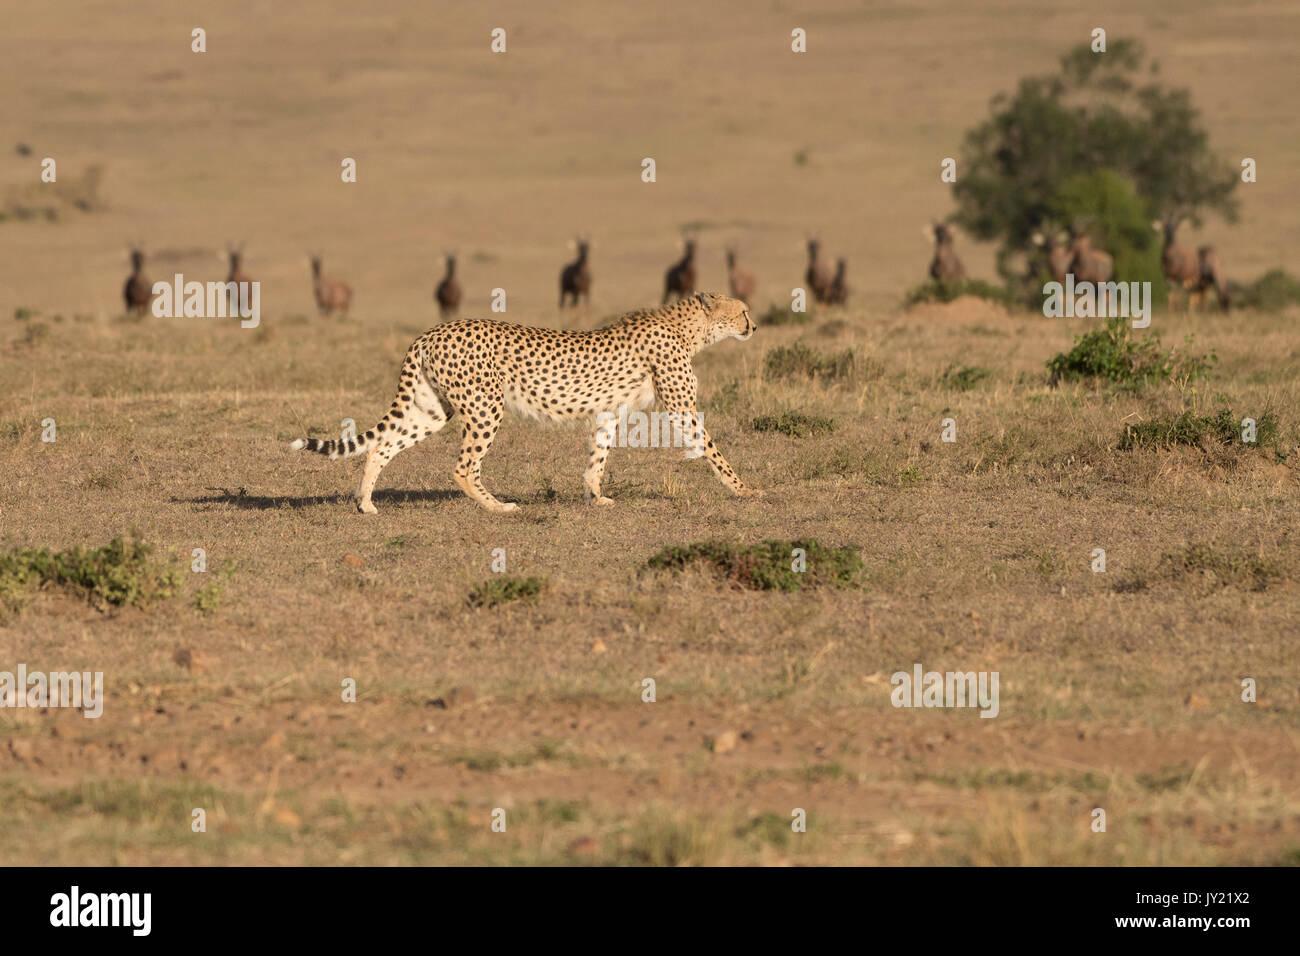 Ghepardo femmina oltrepassando topi antelope fissando come lei va passato nel Masai Mara Game Reserve in Kenya Immagini Stock